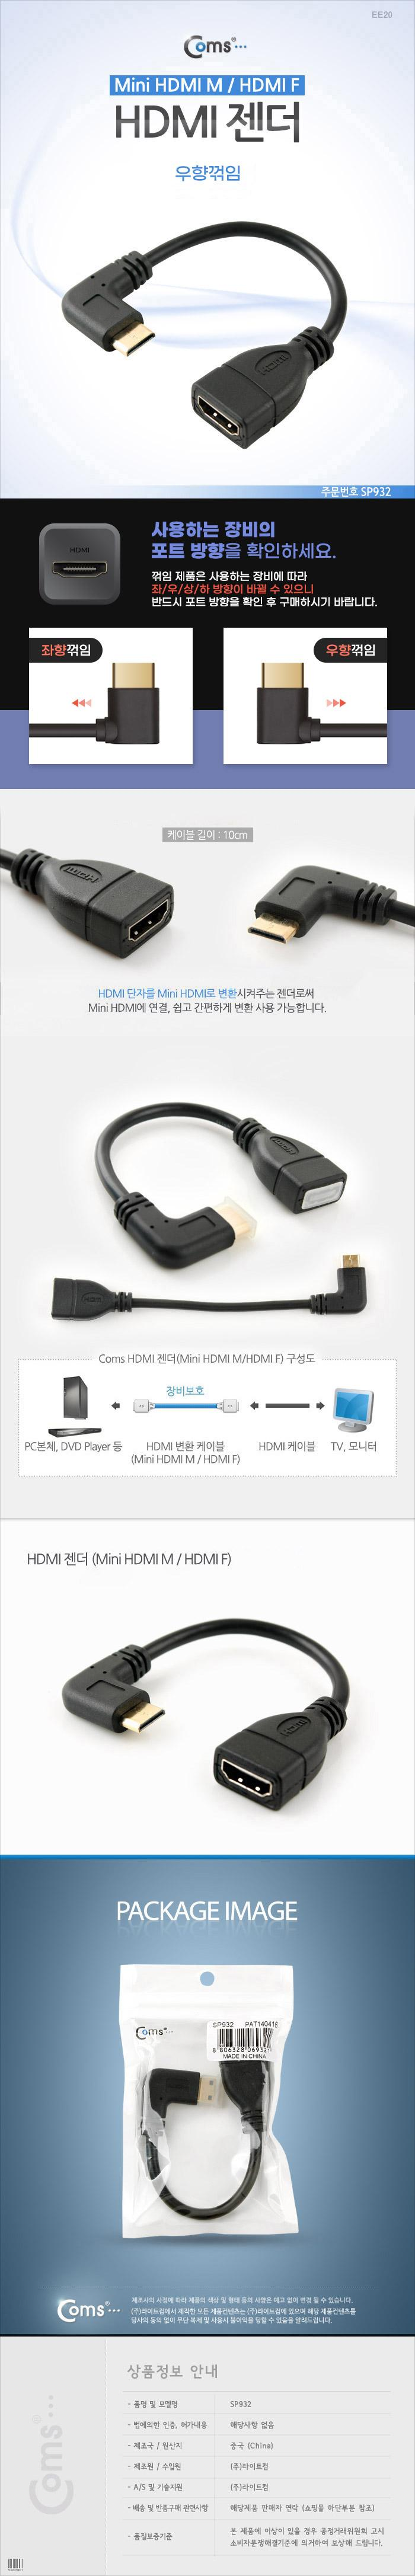 Coms HDMI 젠더(Mini HDMI M HDMI F). 10cm 좌향꺾임(꺽임) PC부품 연장젠더 젠더 PC젠더 노트북연장젠더